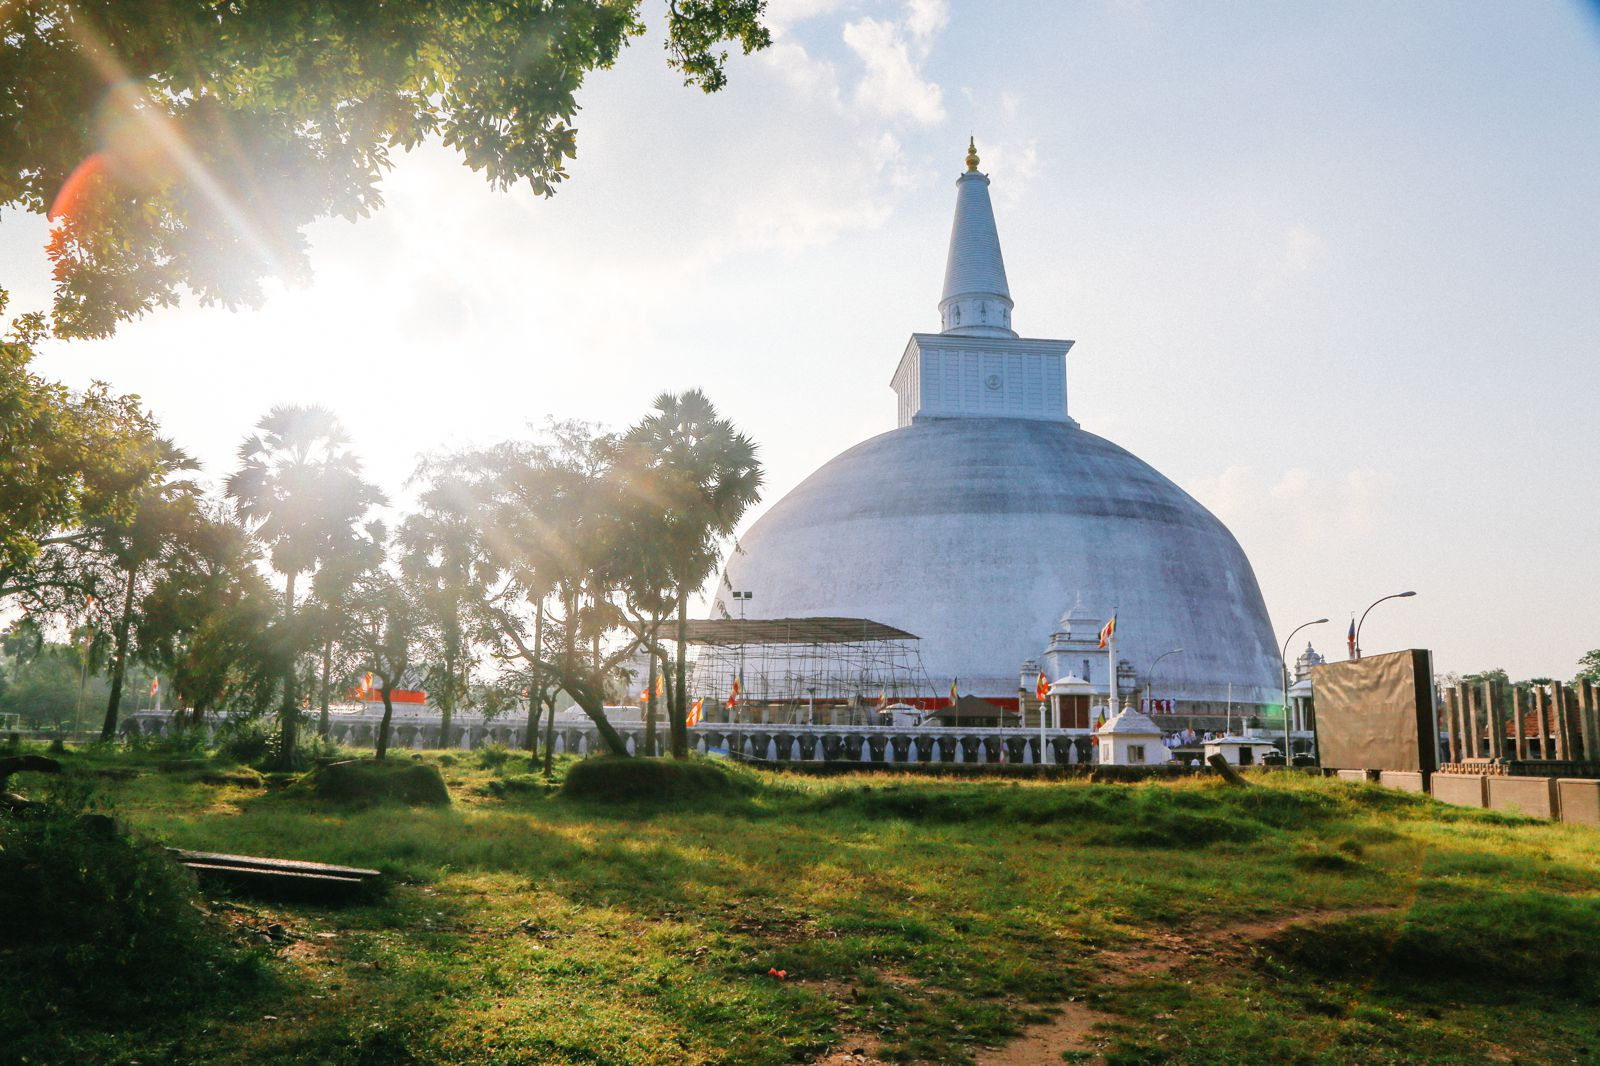 Day 03 - Pinnawala to Anuradhapura